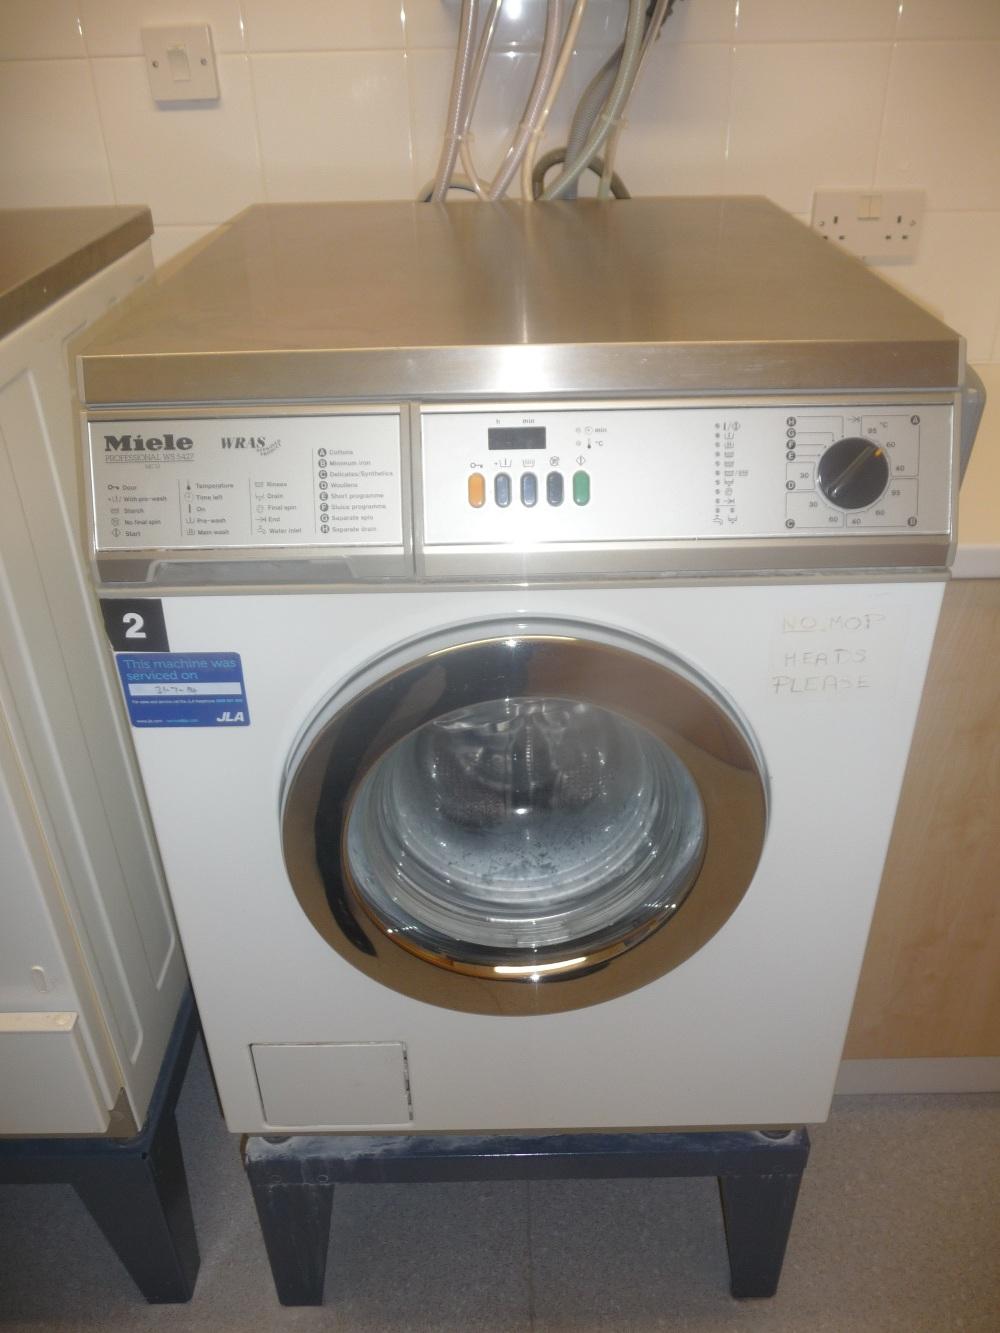 miele professional ws5427 washing machine. Black Bedroom Furniture Sets. Home Design Ideas